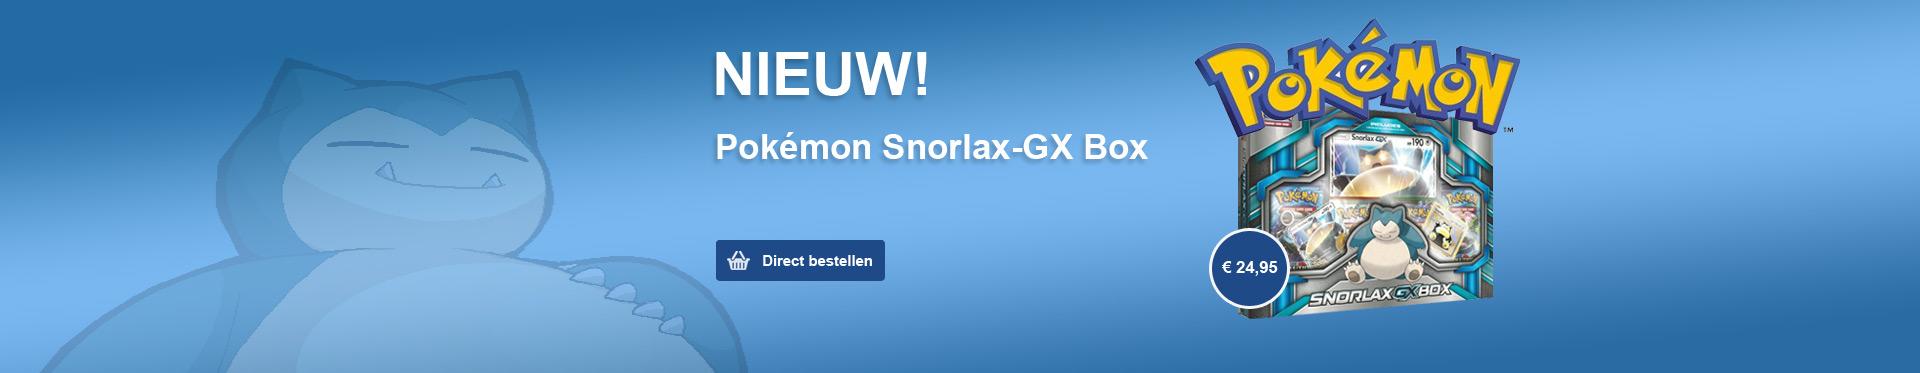 Pokemon Snorlax Box